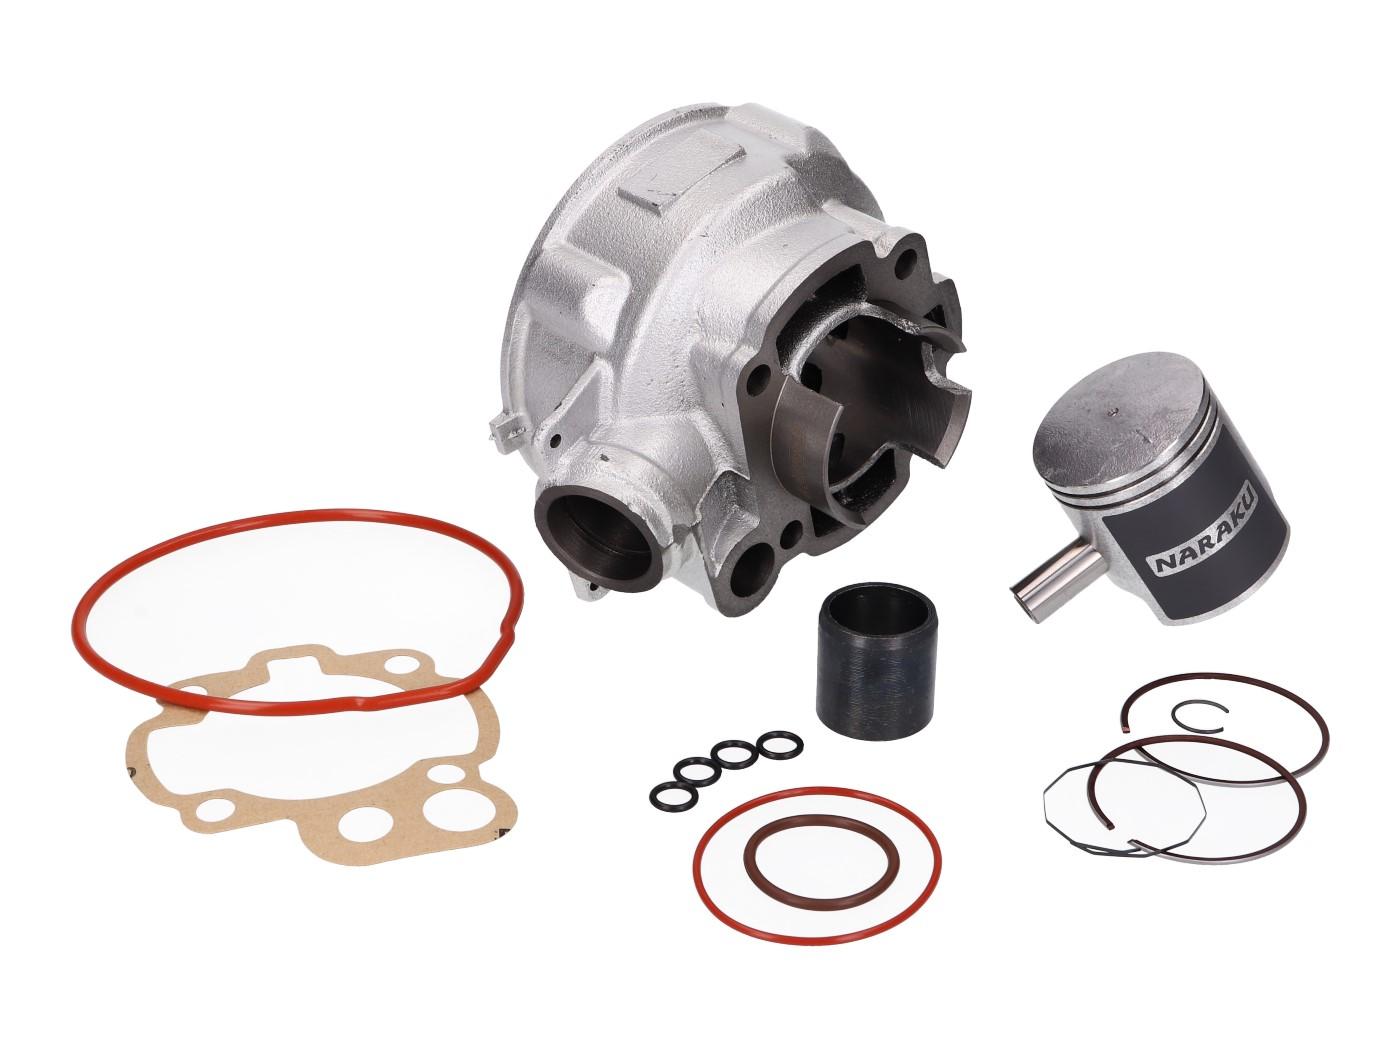 Yamaha TZR 50 AM6 post 2003 AM6 70cc Cylinder Gasket Piston Kit